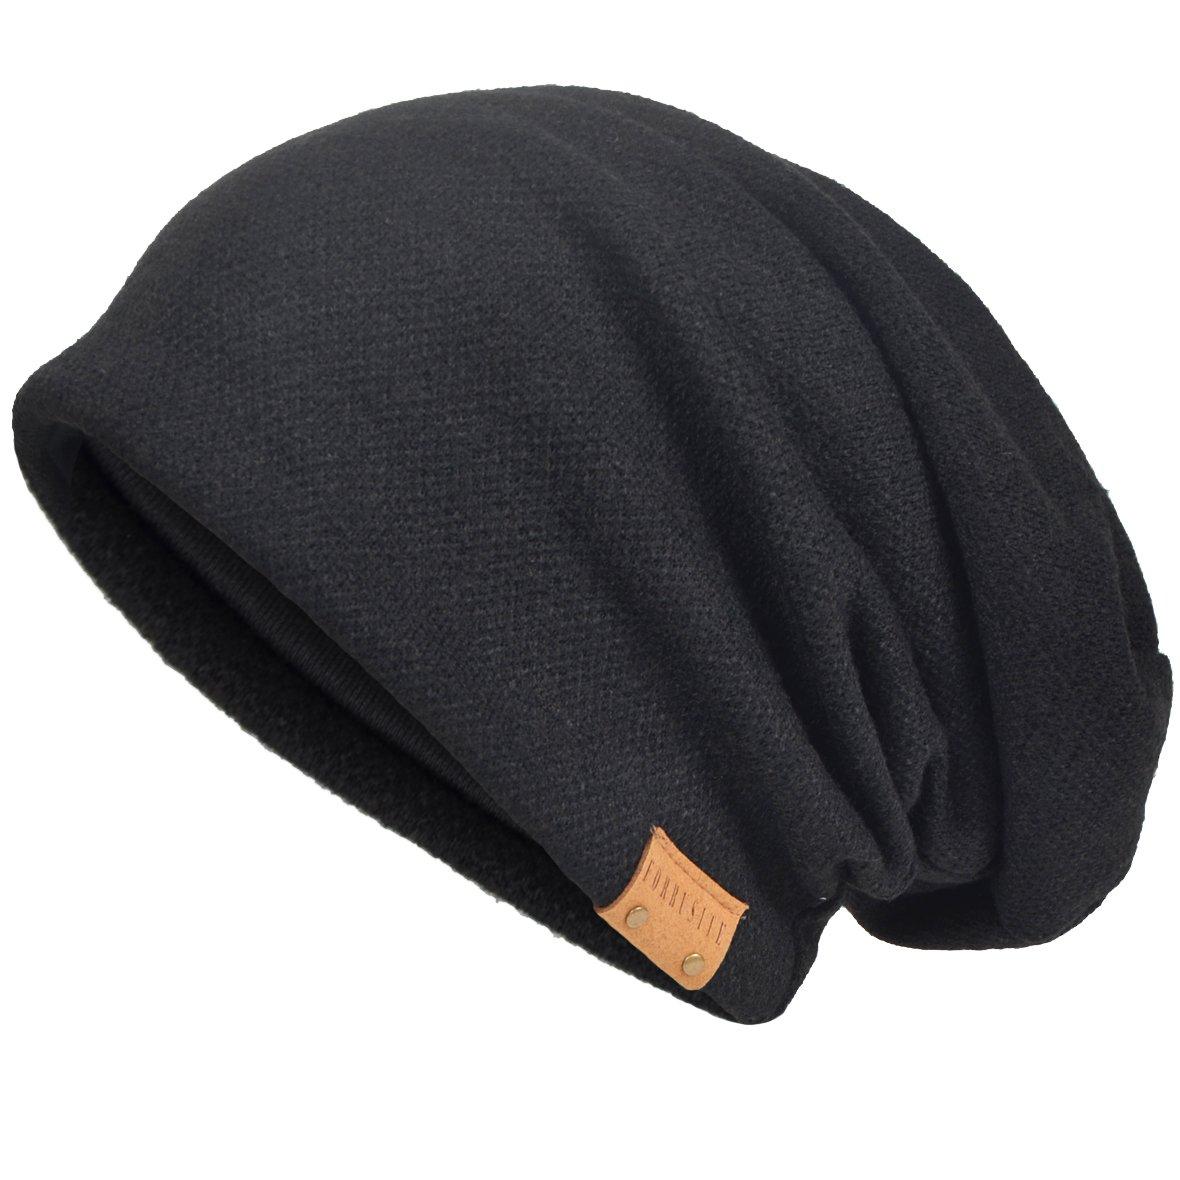 VECRY Men's Cool Cotton Beanie Slouch Skull Cap Long Baggy Hip-hop Winter Summer Hat (Black)